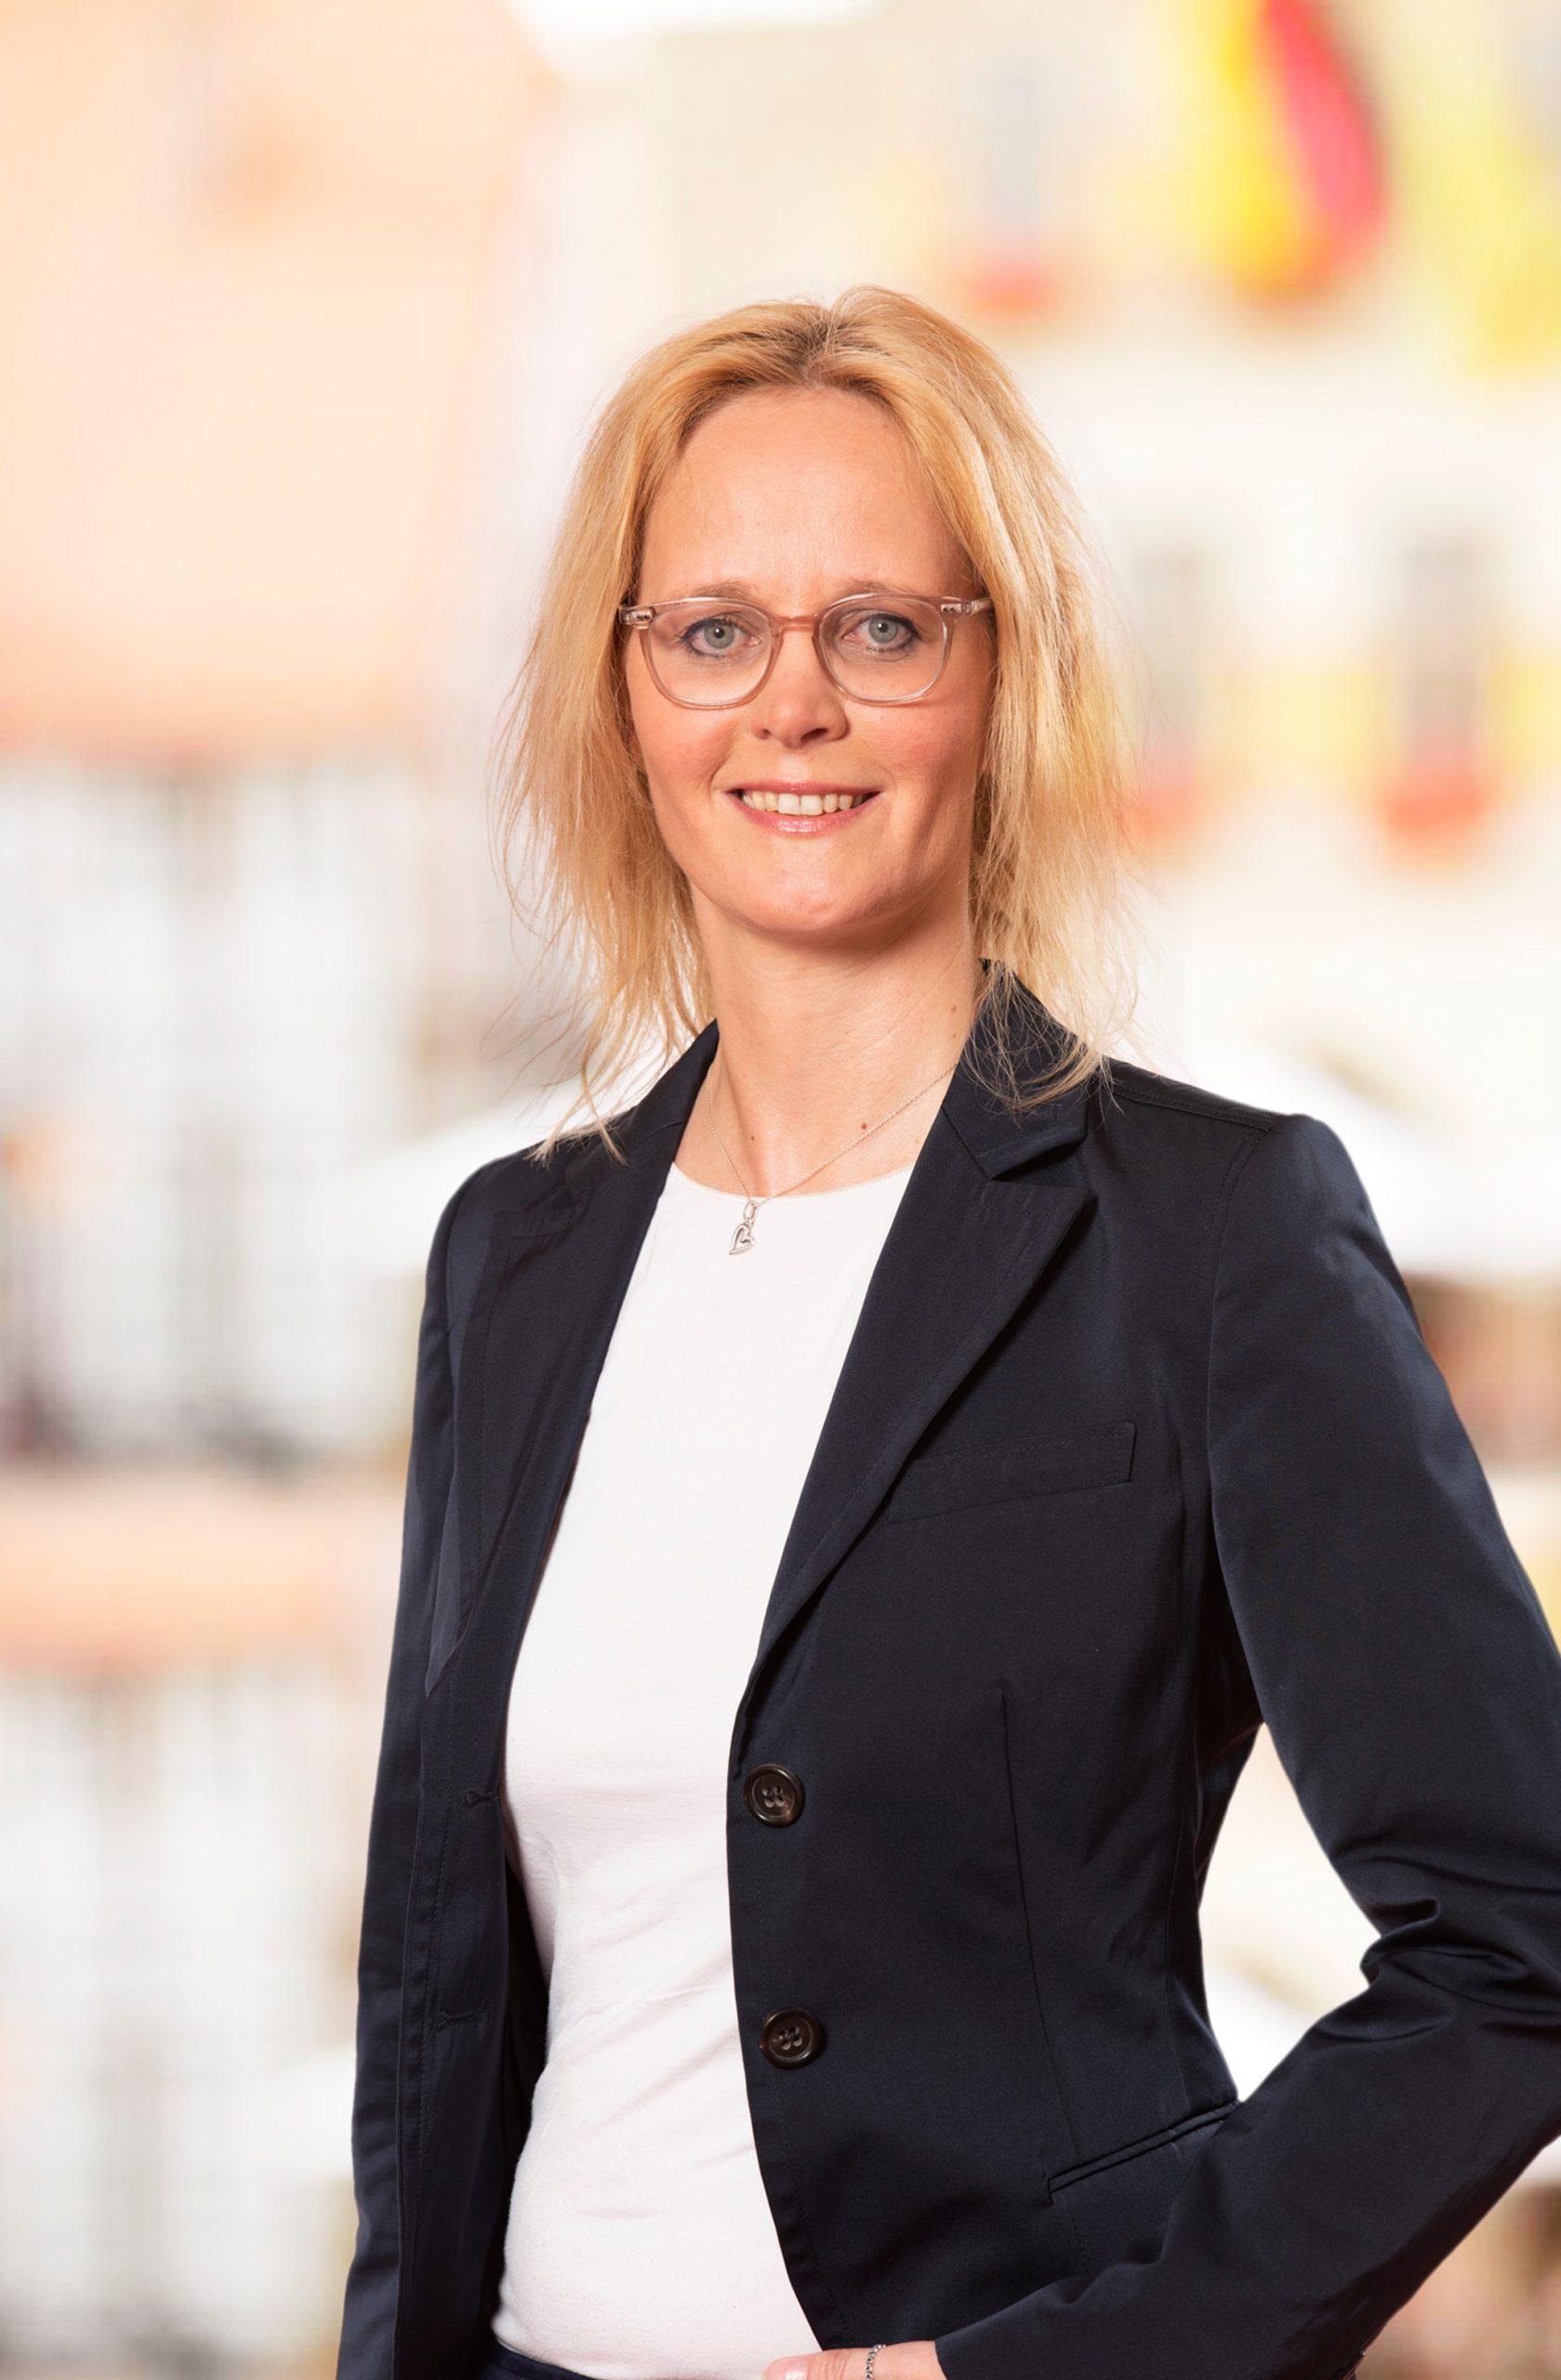 Annika Brauksiepe